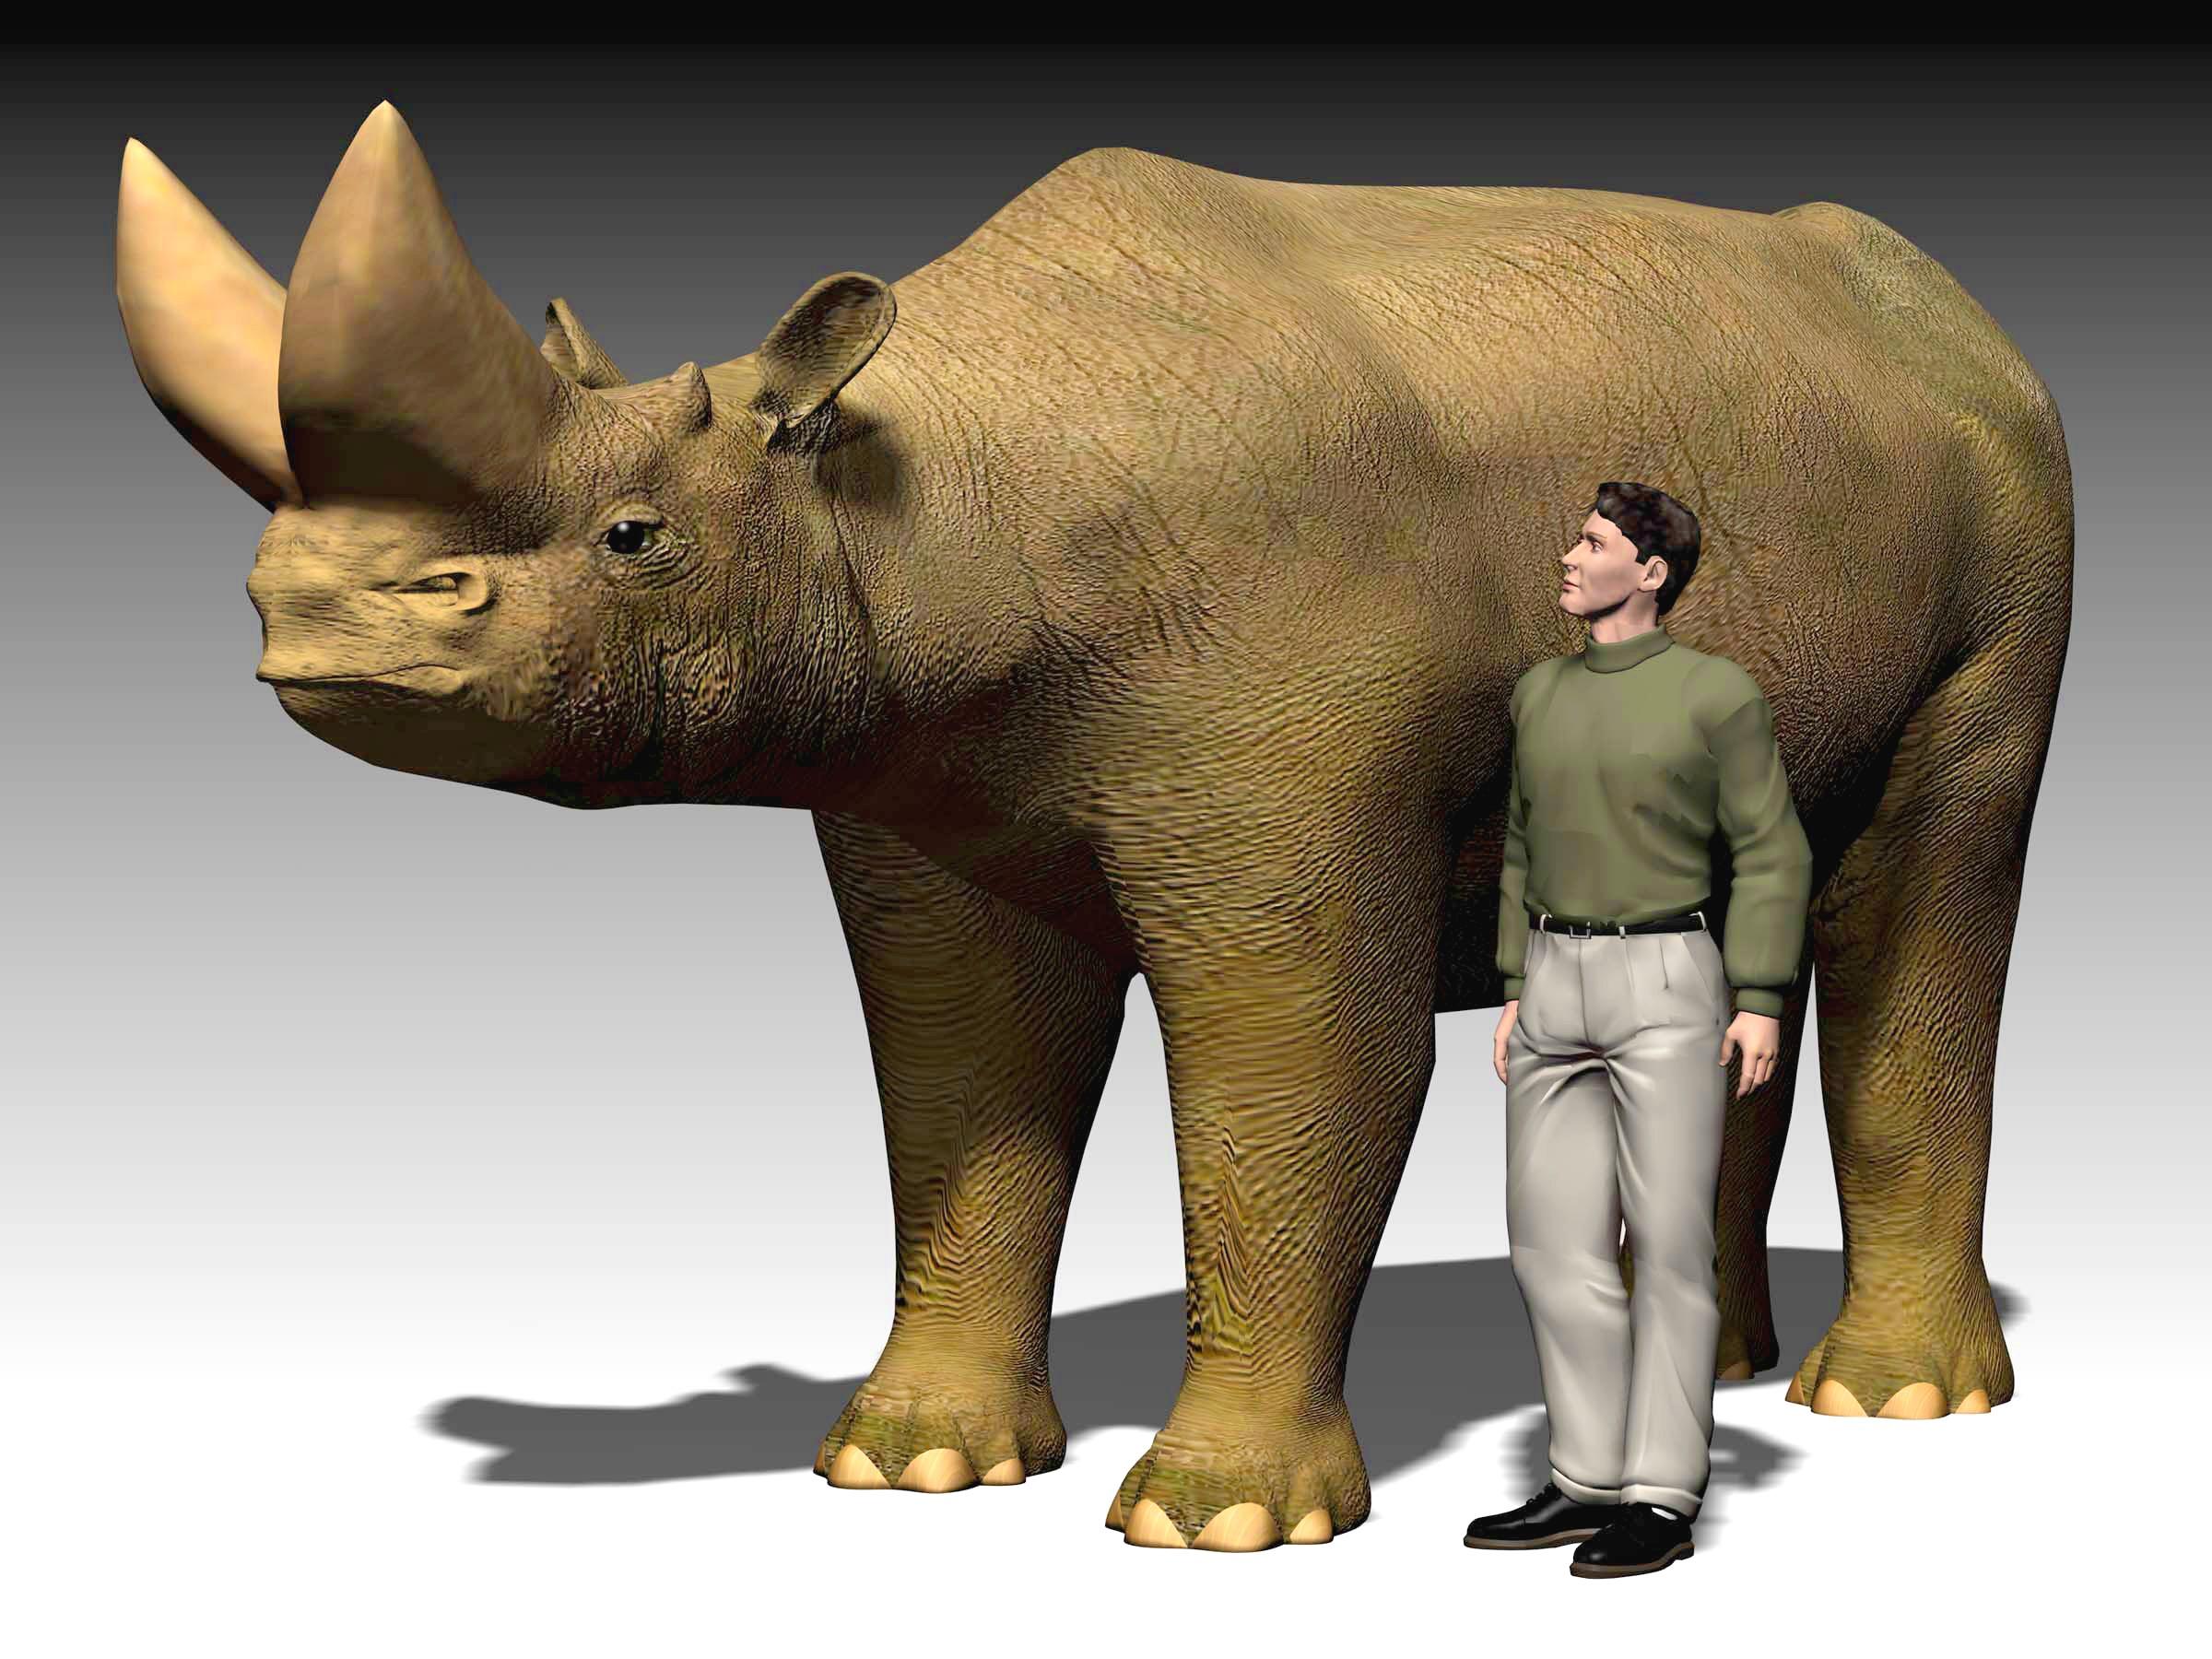 Arsinoitherium giganteum - Wikiwand - 548.6KB